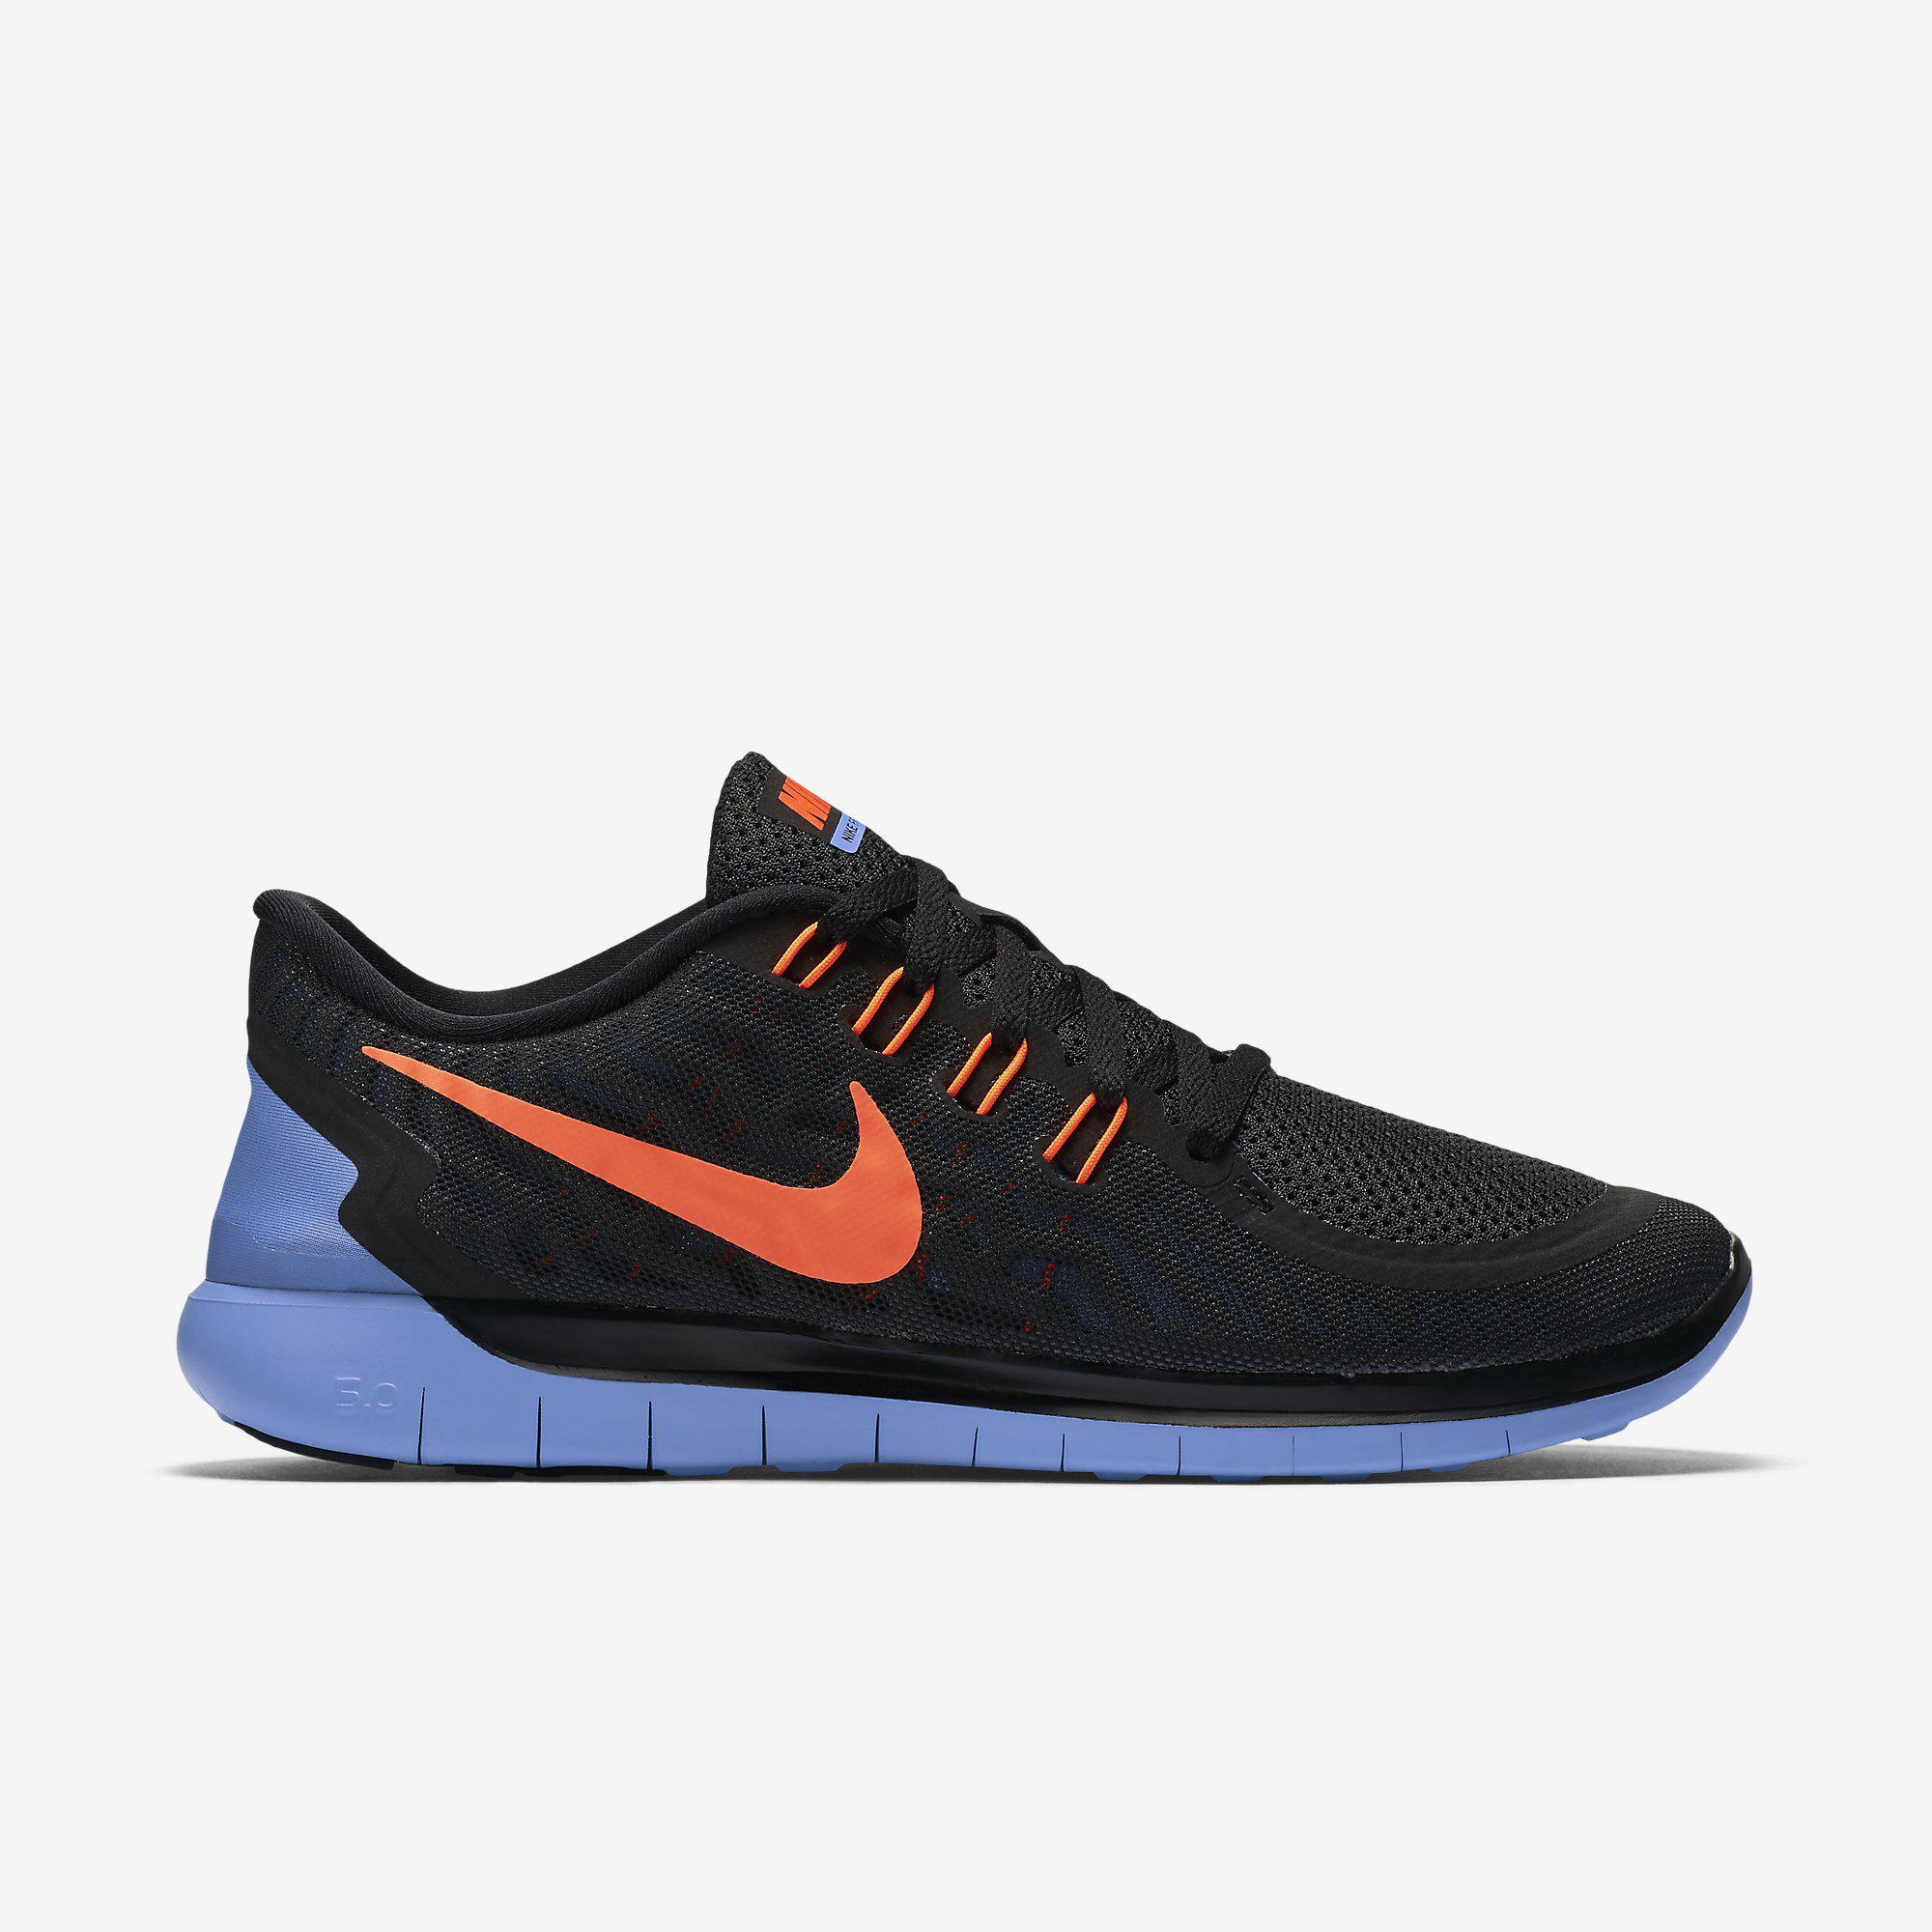 super popular 40732 d65d9 Nike Womens Free 5.0 Running Shoes - Black Blue - Tennisnuts.com